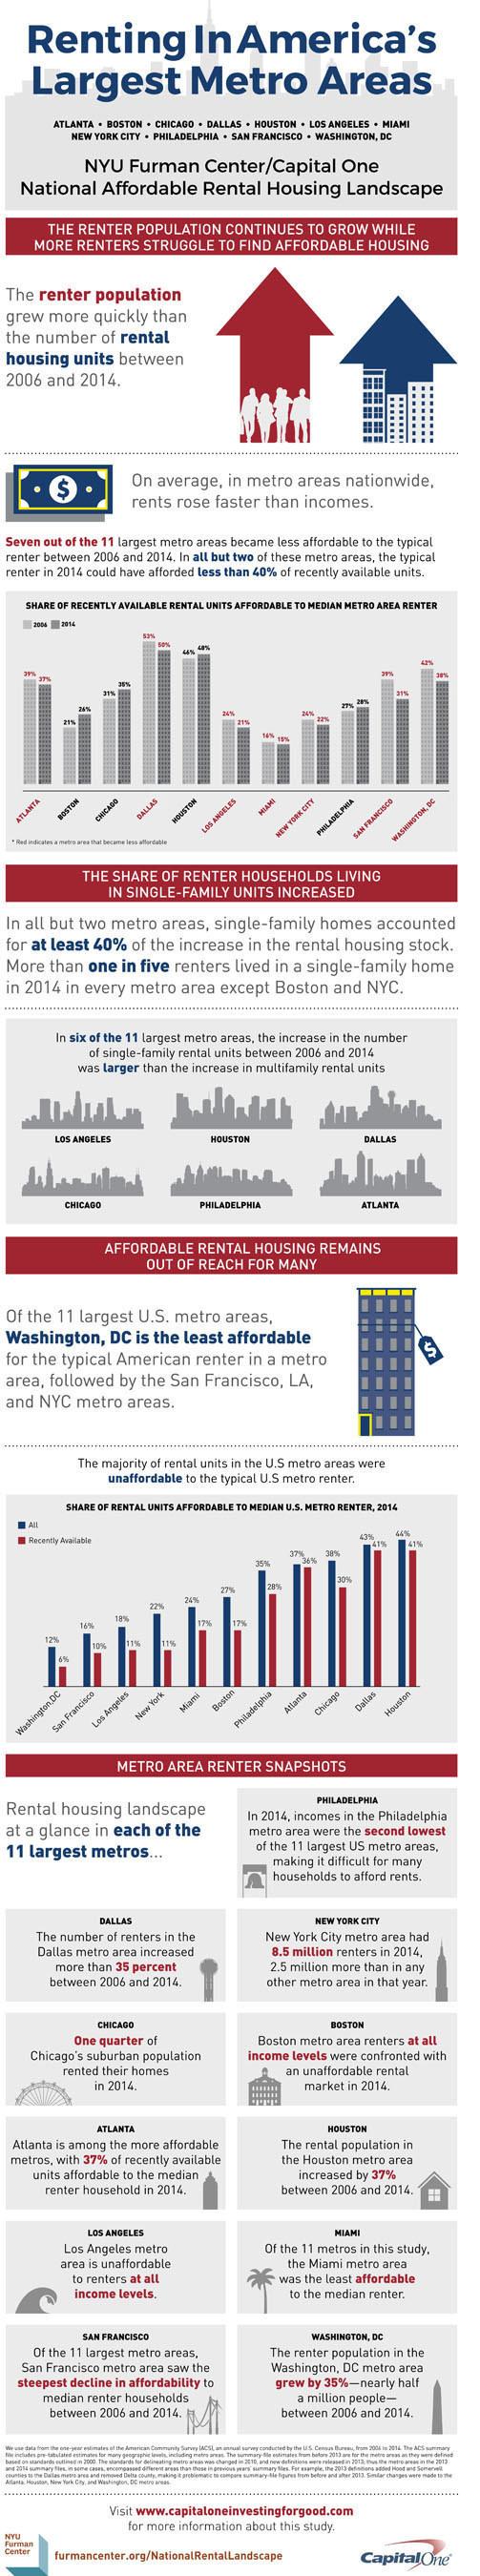 NYU Furman Center / Capital One National Affordable Rental Housing Landscape